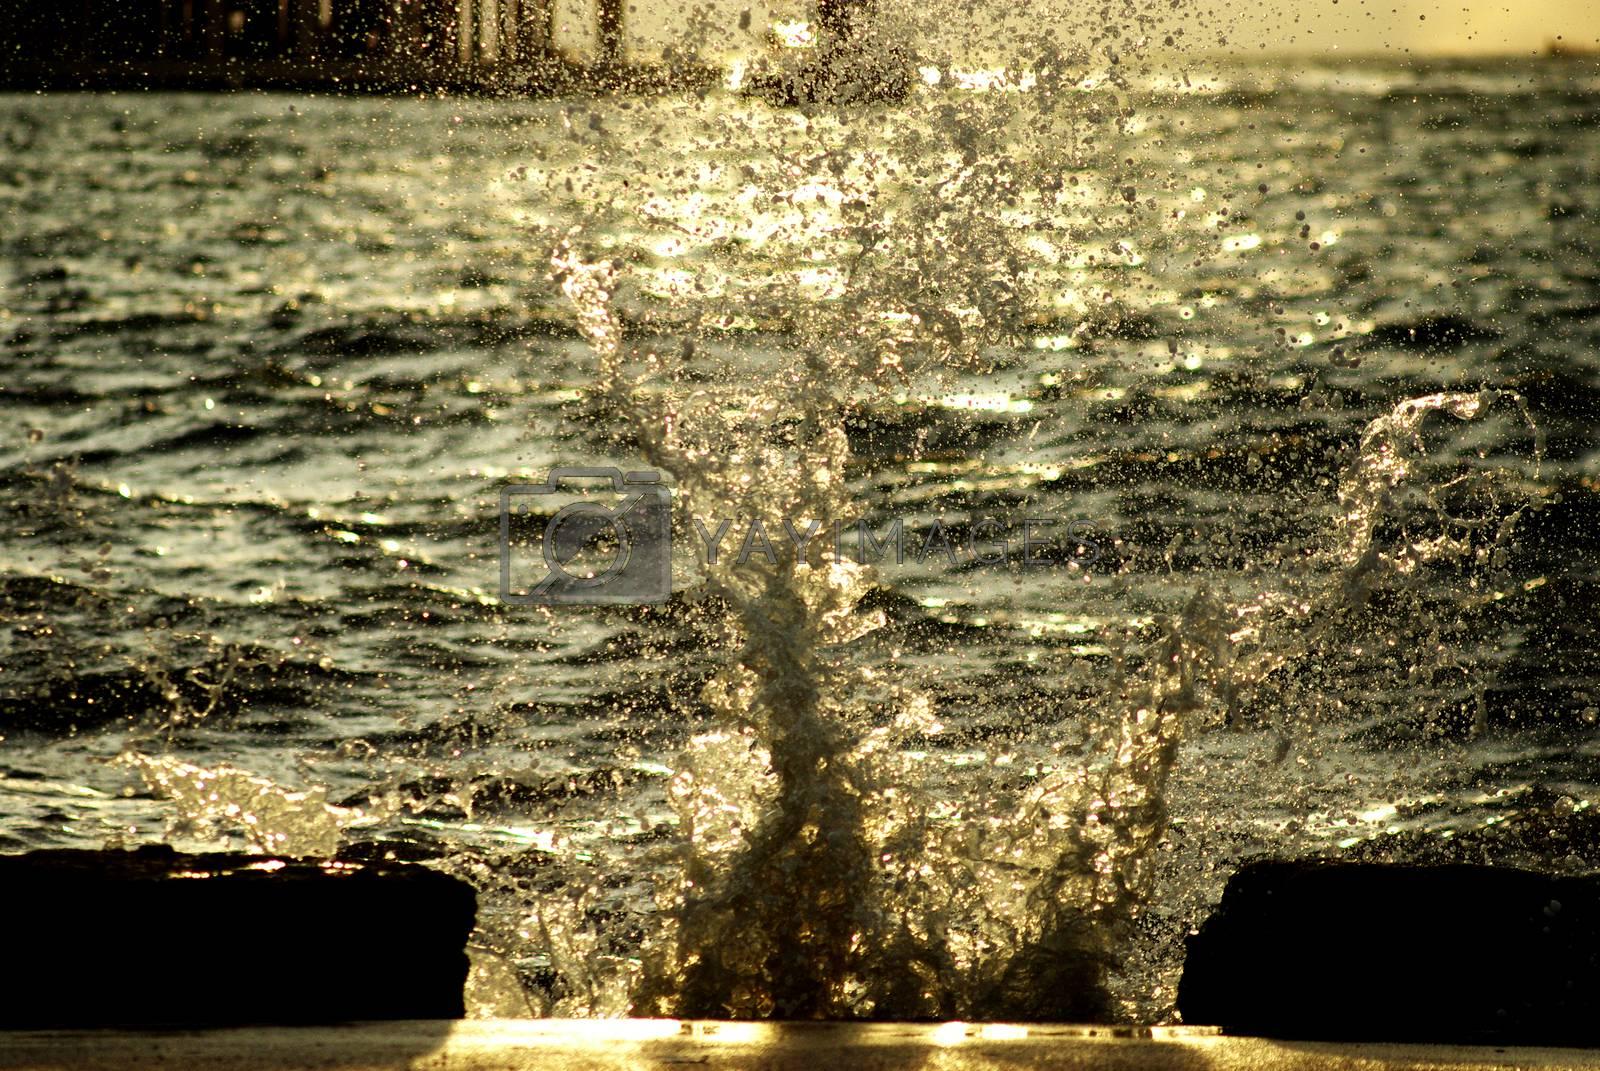 Royalty free image of Splashing wave by pixbox77